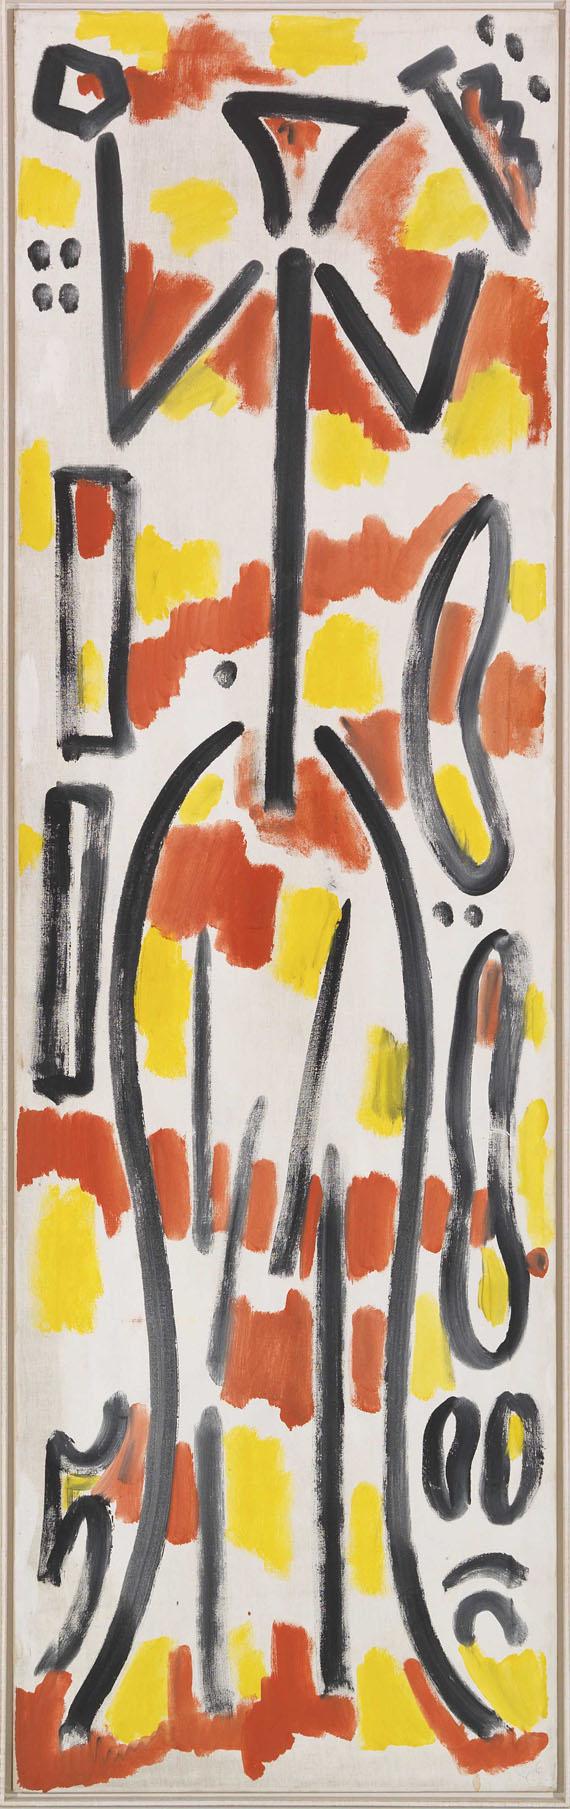 A. R. Penck (d.i. Ralf Winkler) - Projekt Germania (Konzept G) - Rahmenbild